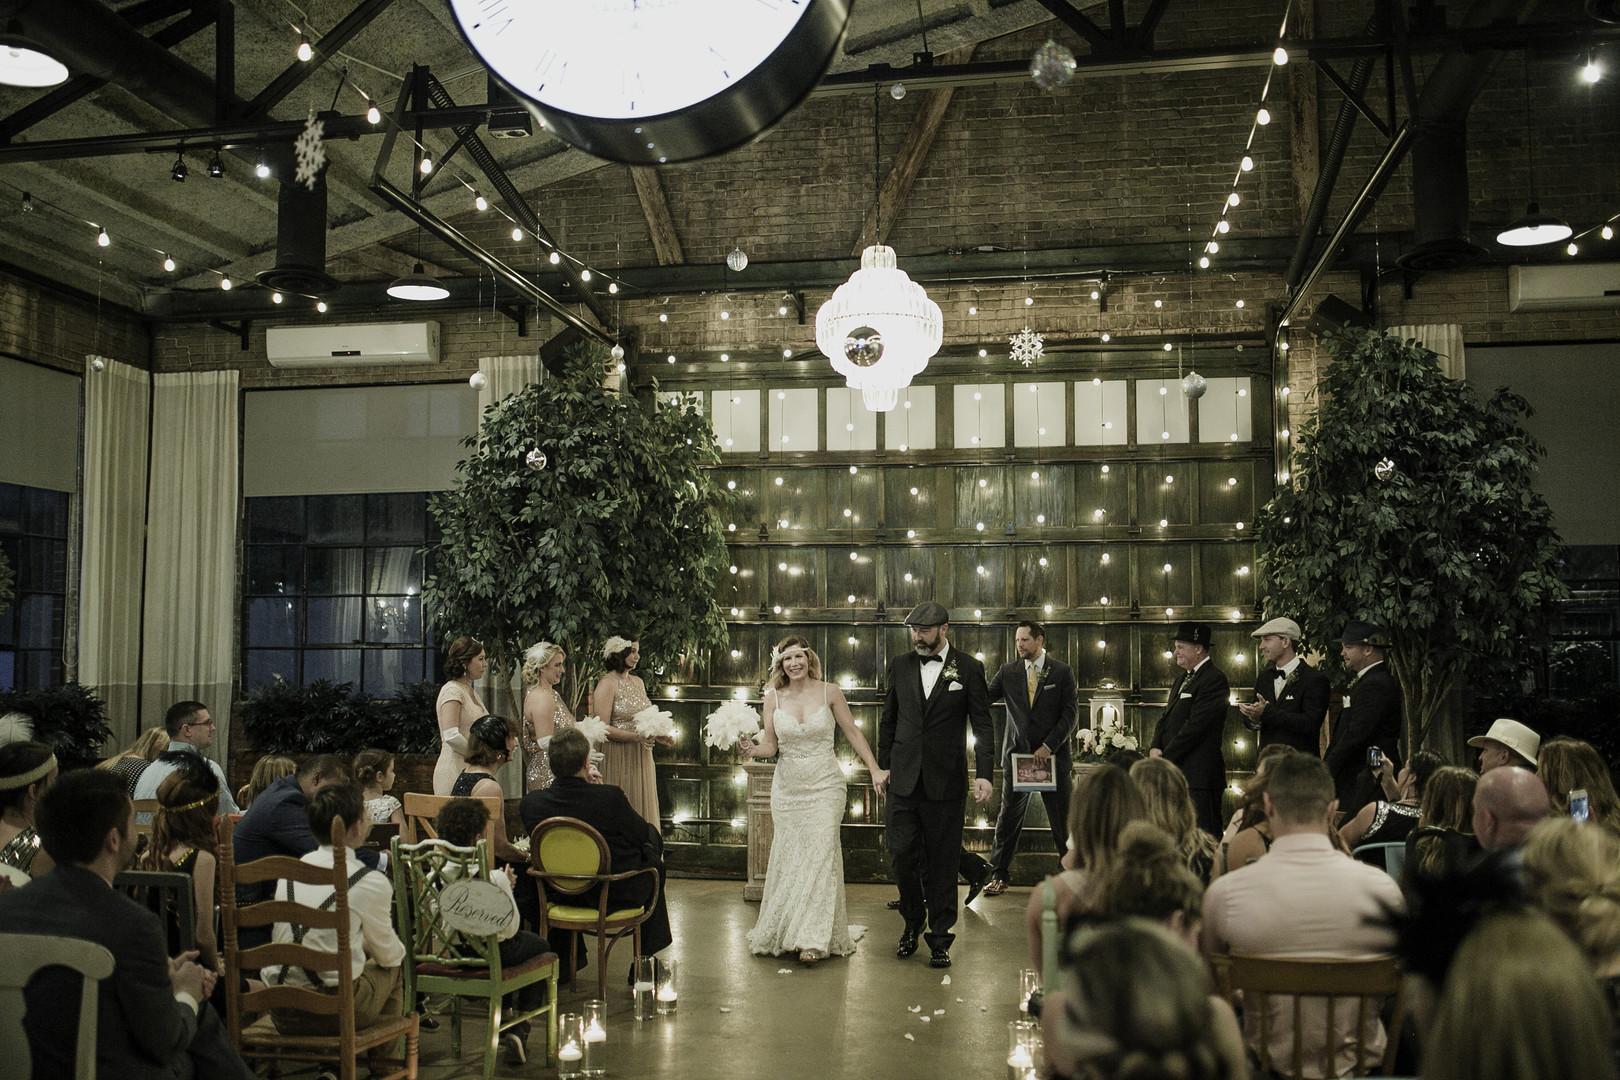 soho-south-cafe-wedding-27.jpg